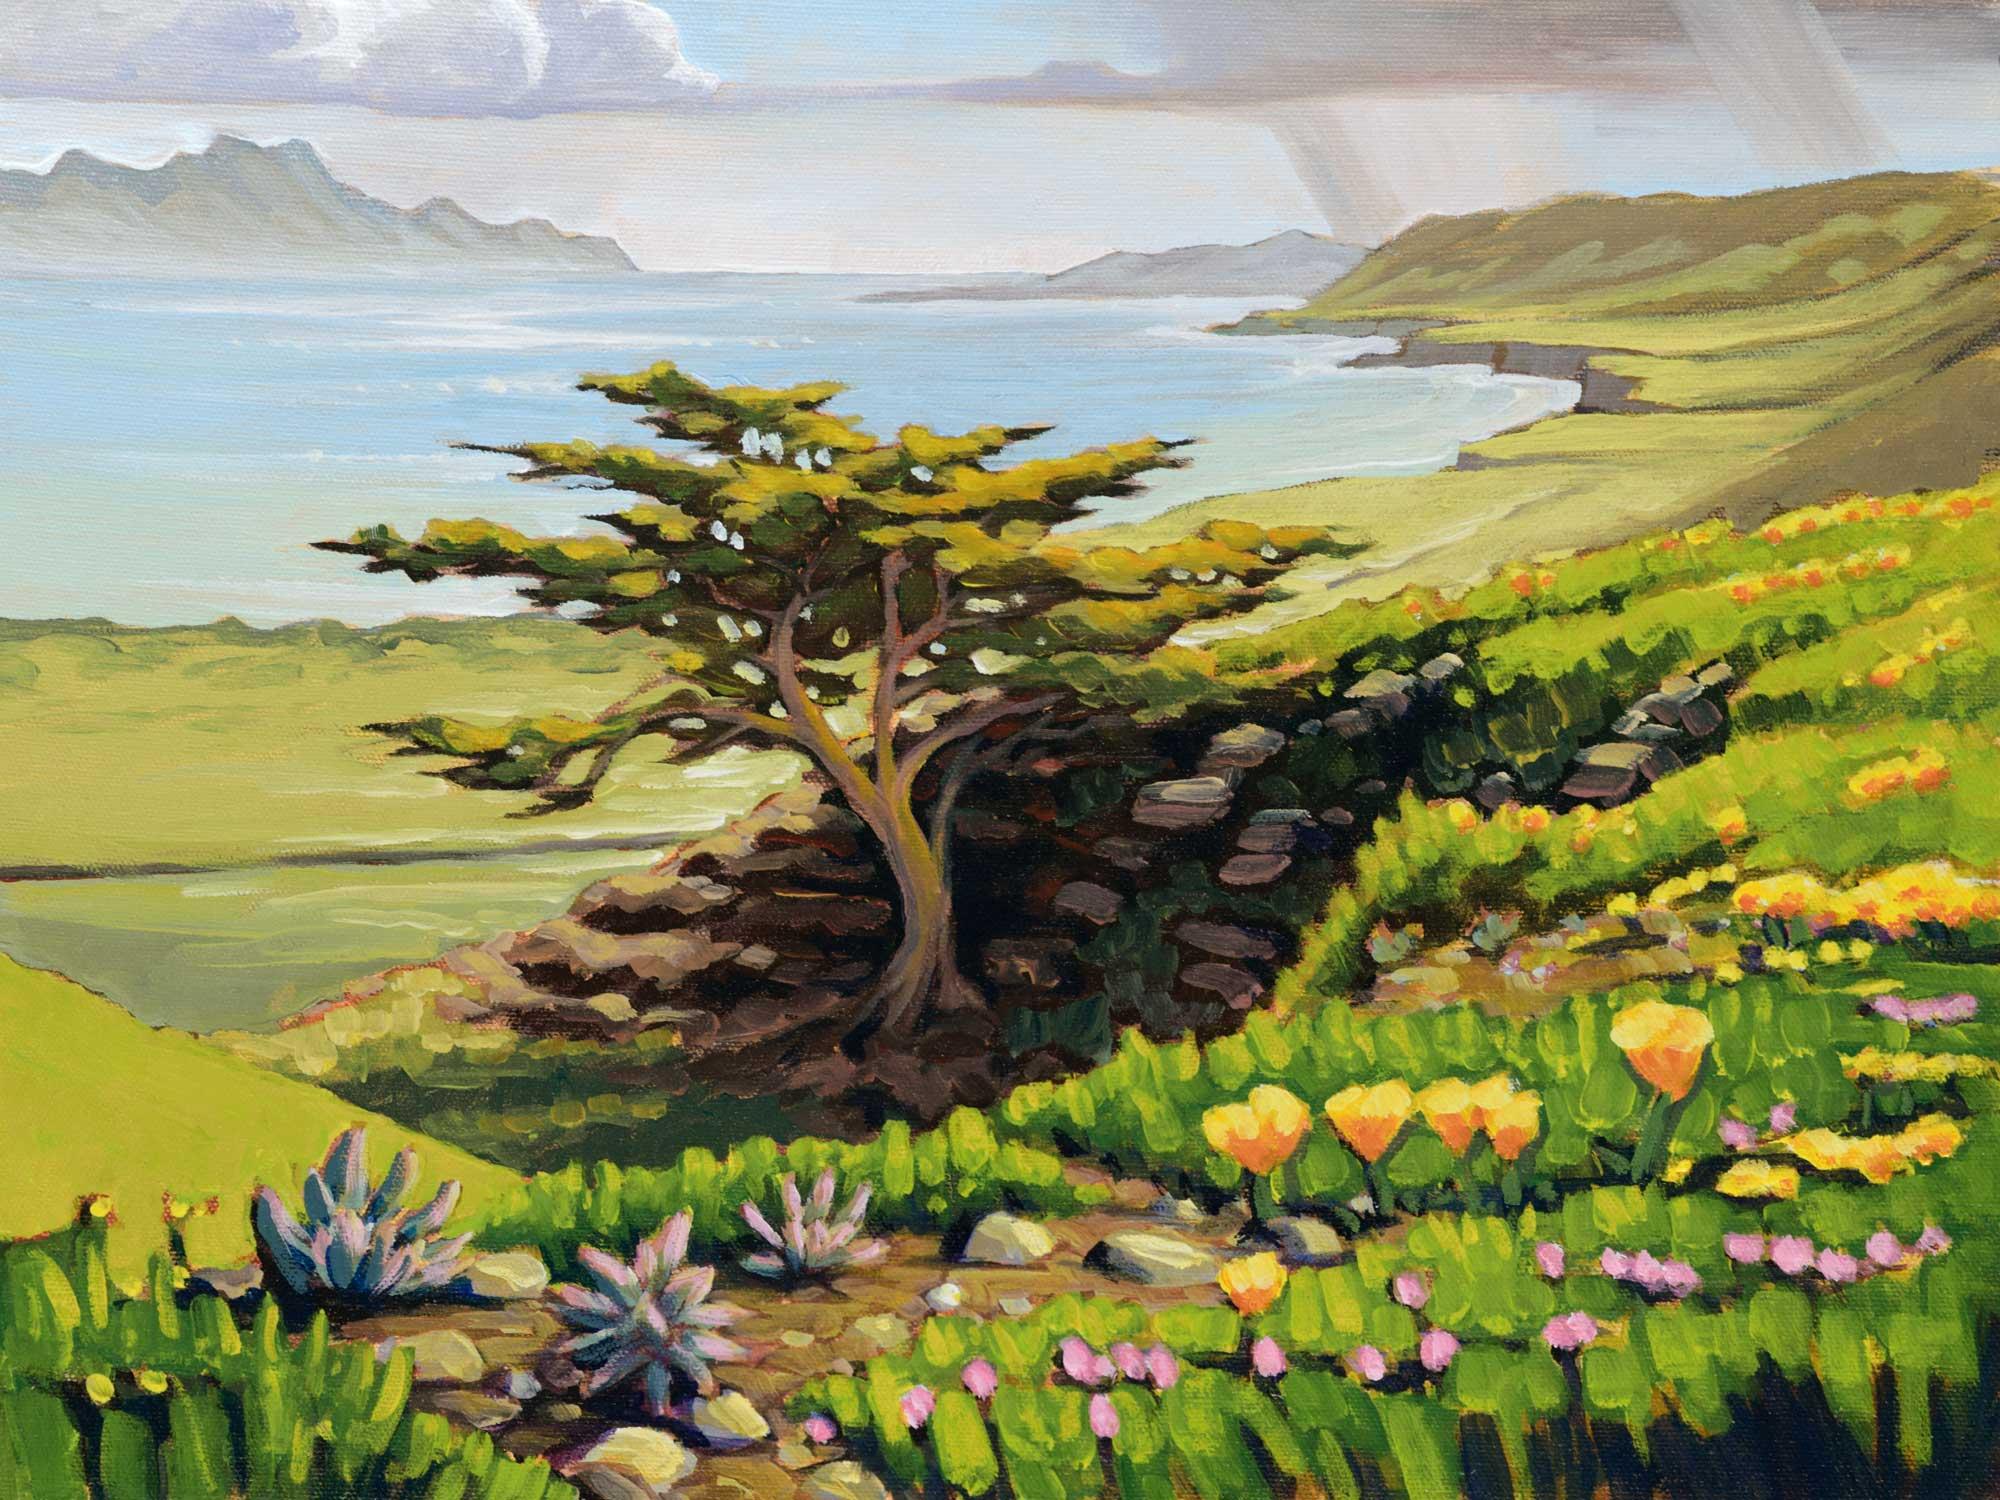 Plein air artwork overlooking Becher's Bay and Santa Cruz Island from Santa Rosa Island off the coast of California